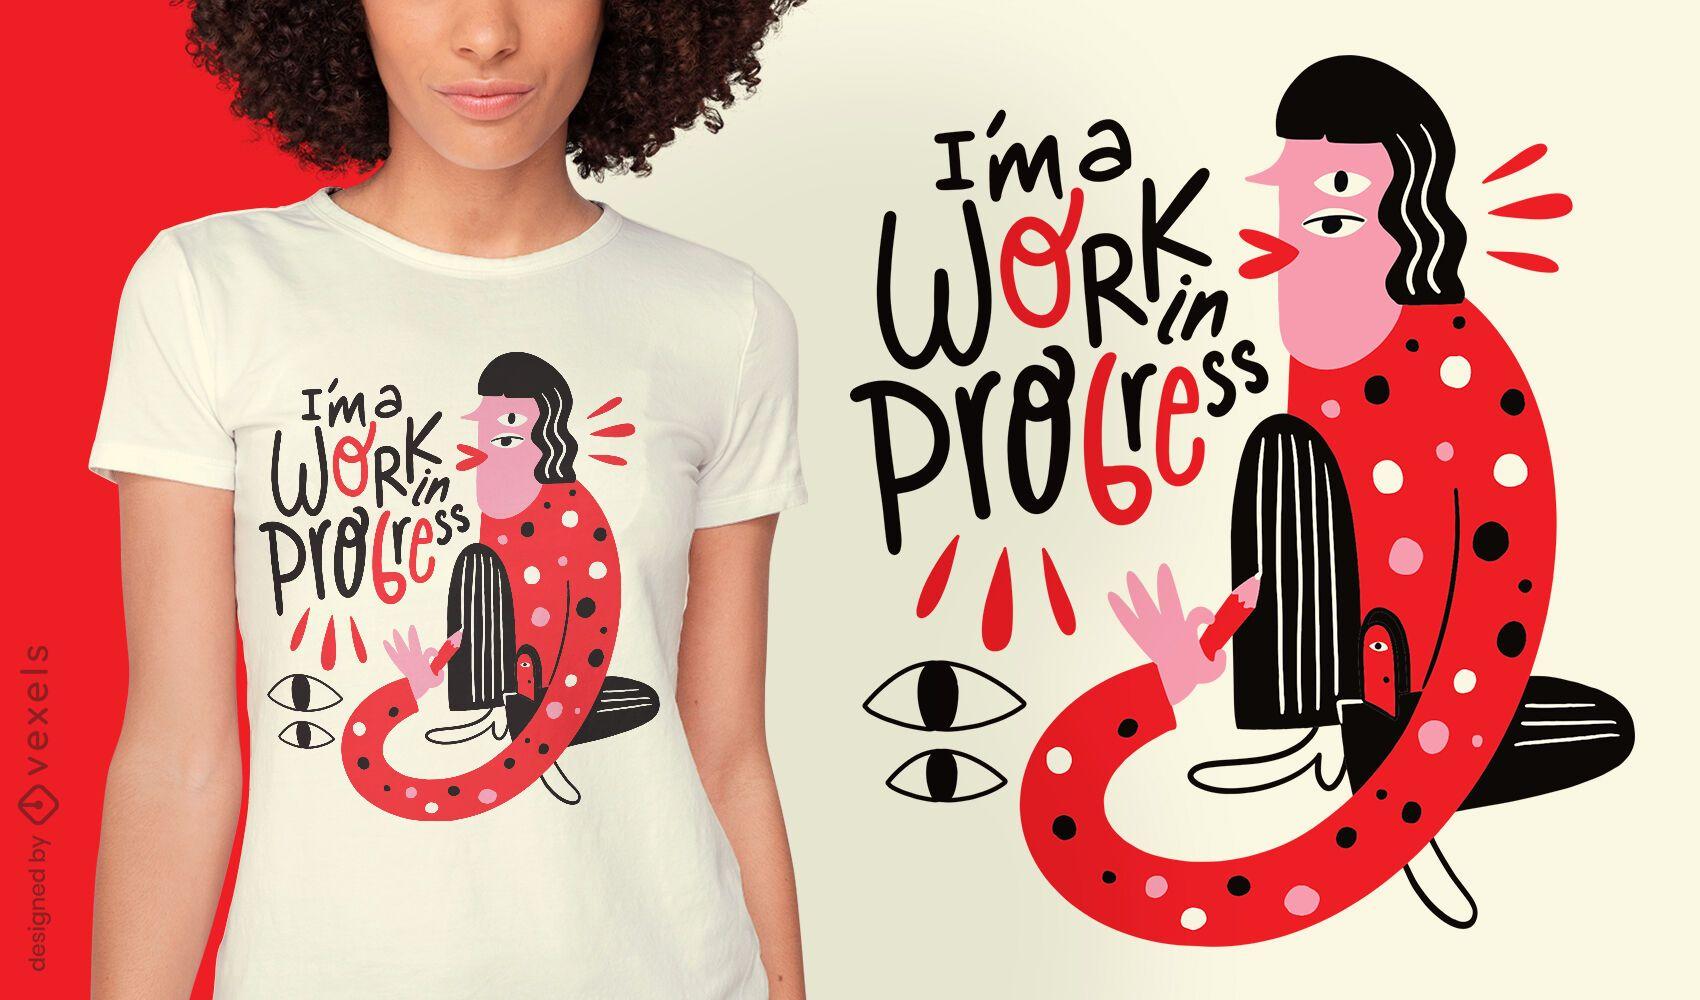 Motivation abstract creature t-shirt design